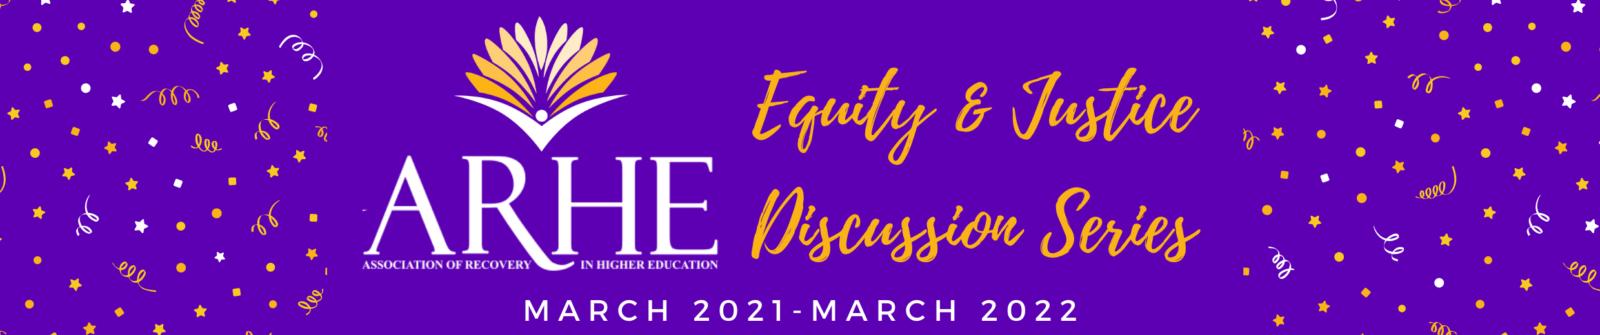 ARHE EJ Webinar Site Banner Discussion Series